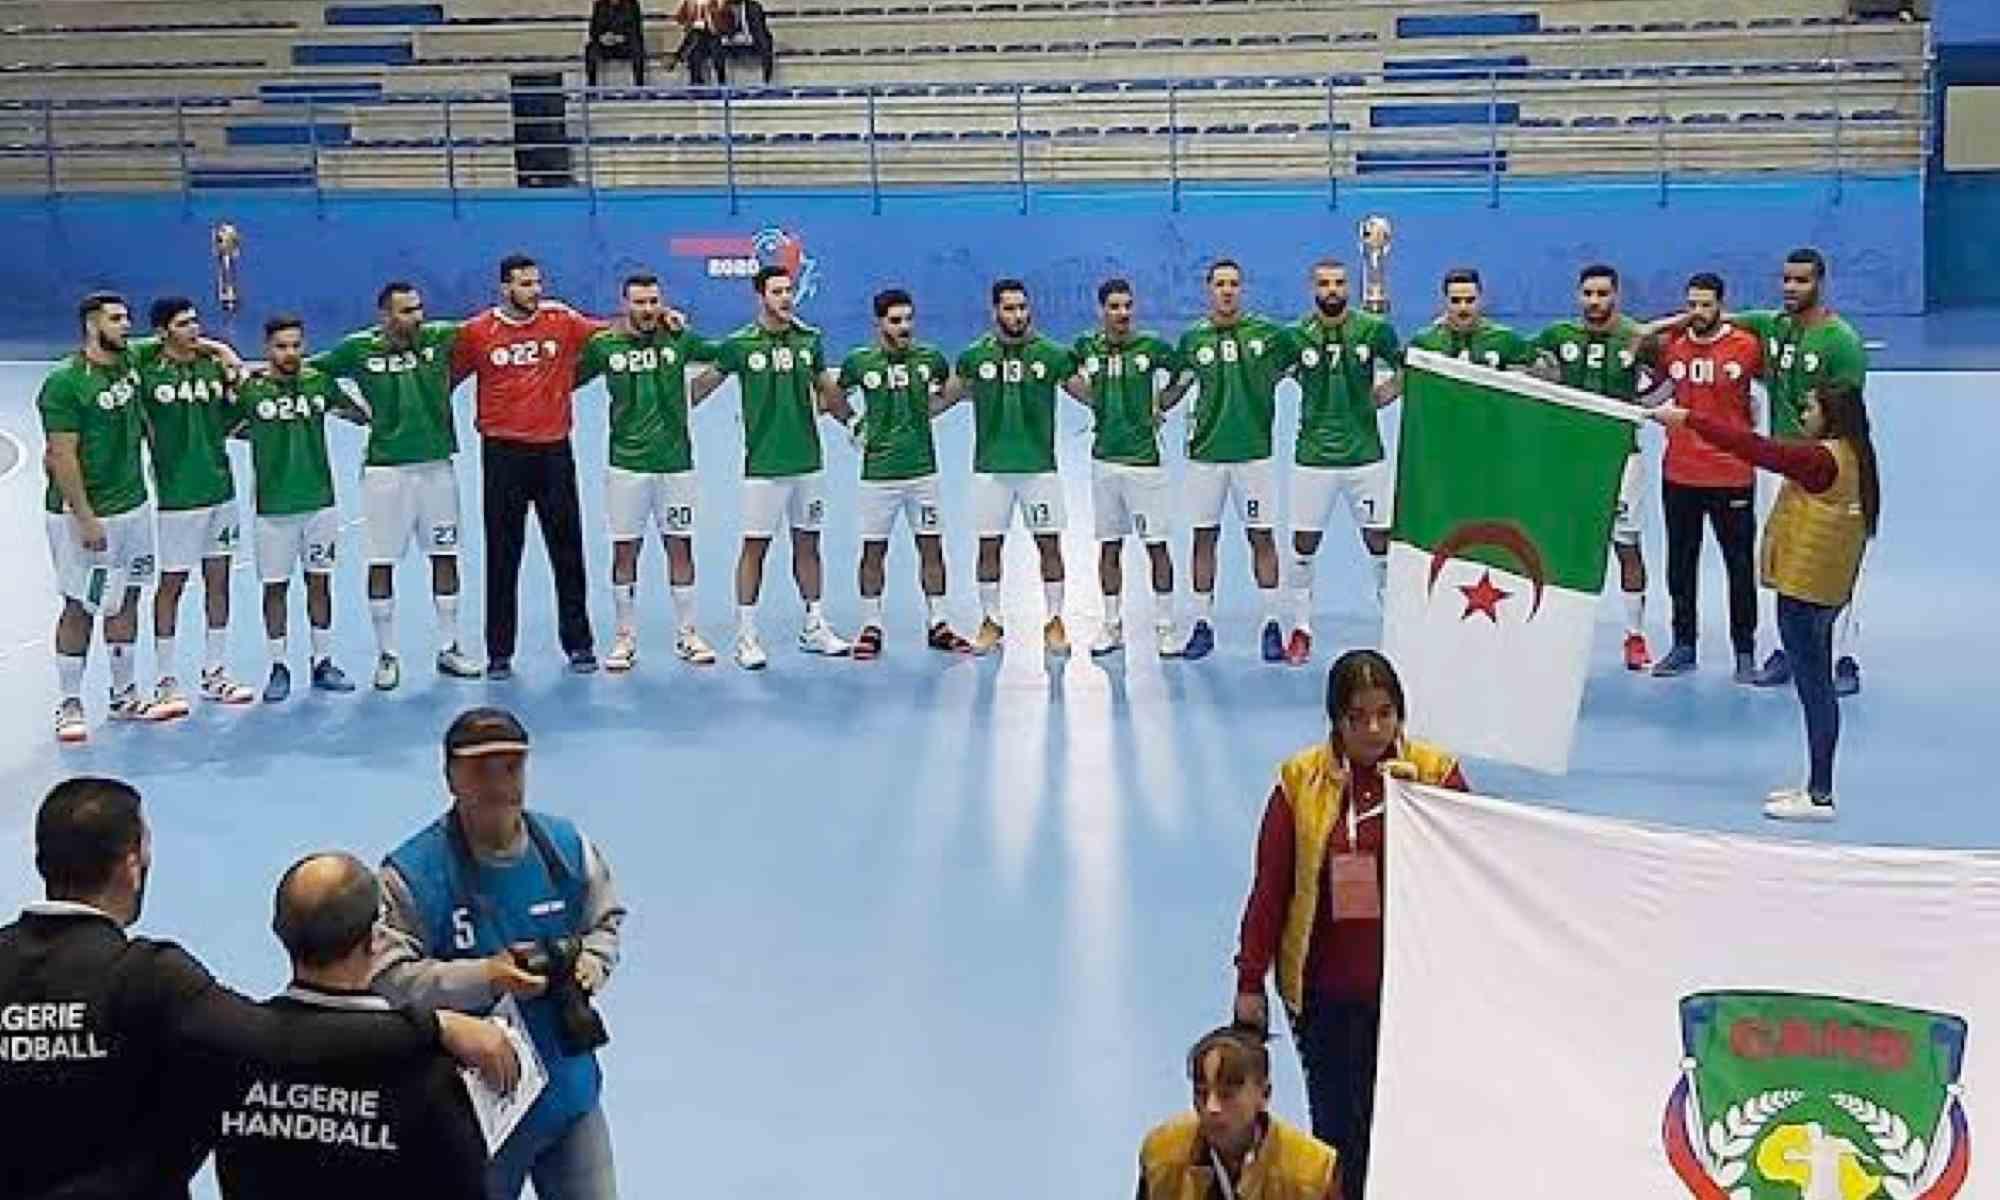 handball can2020 team algerie